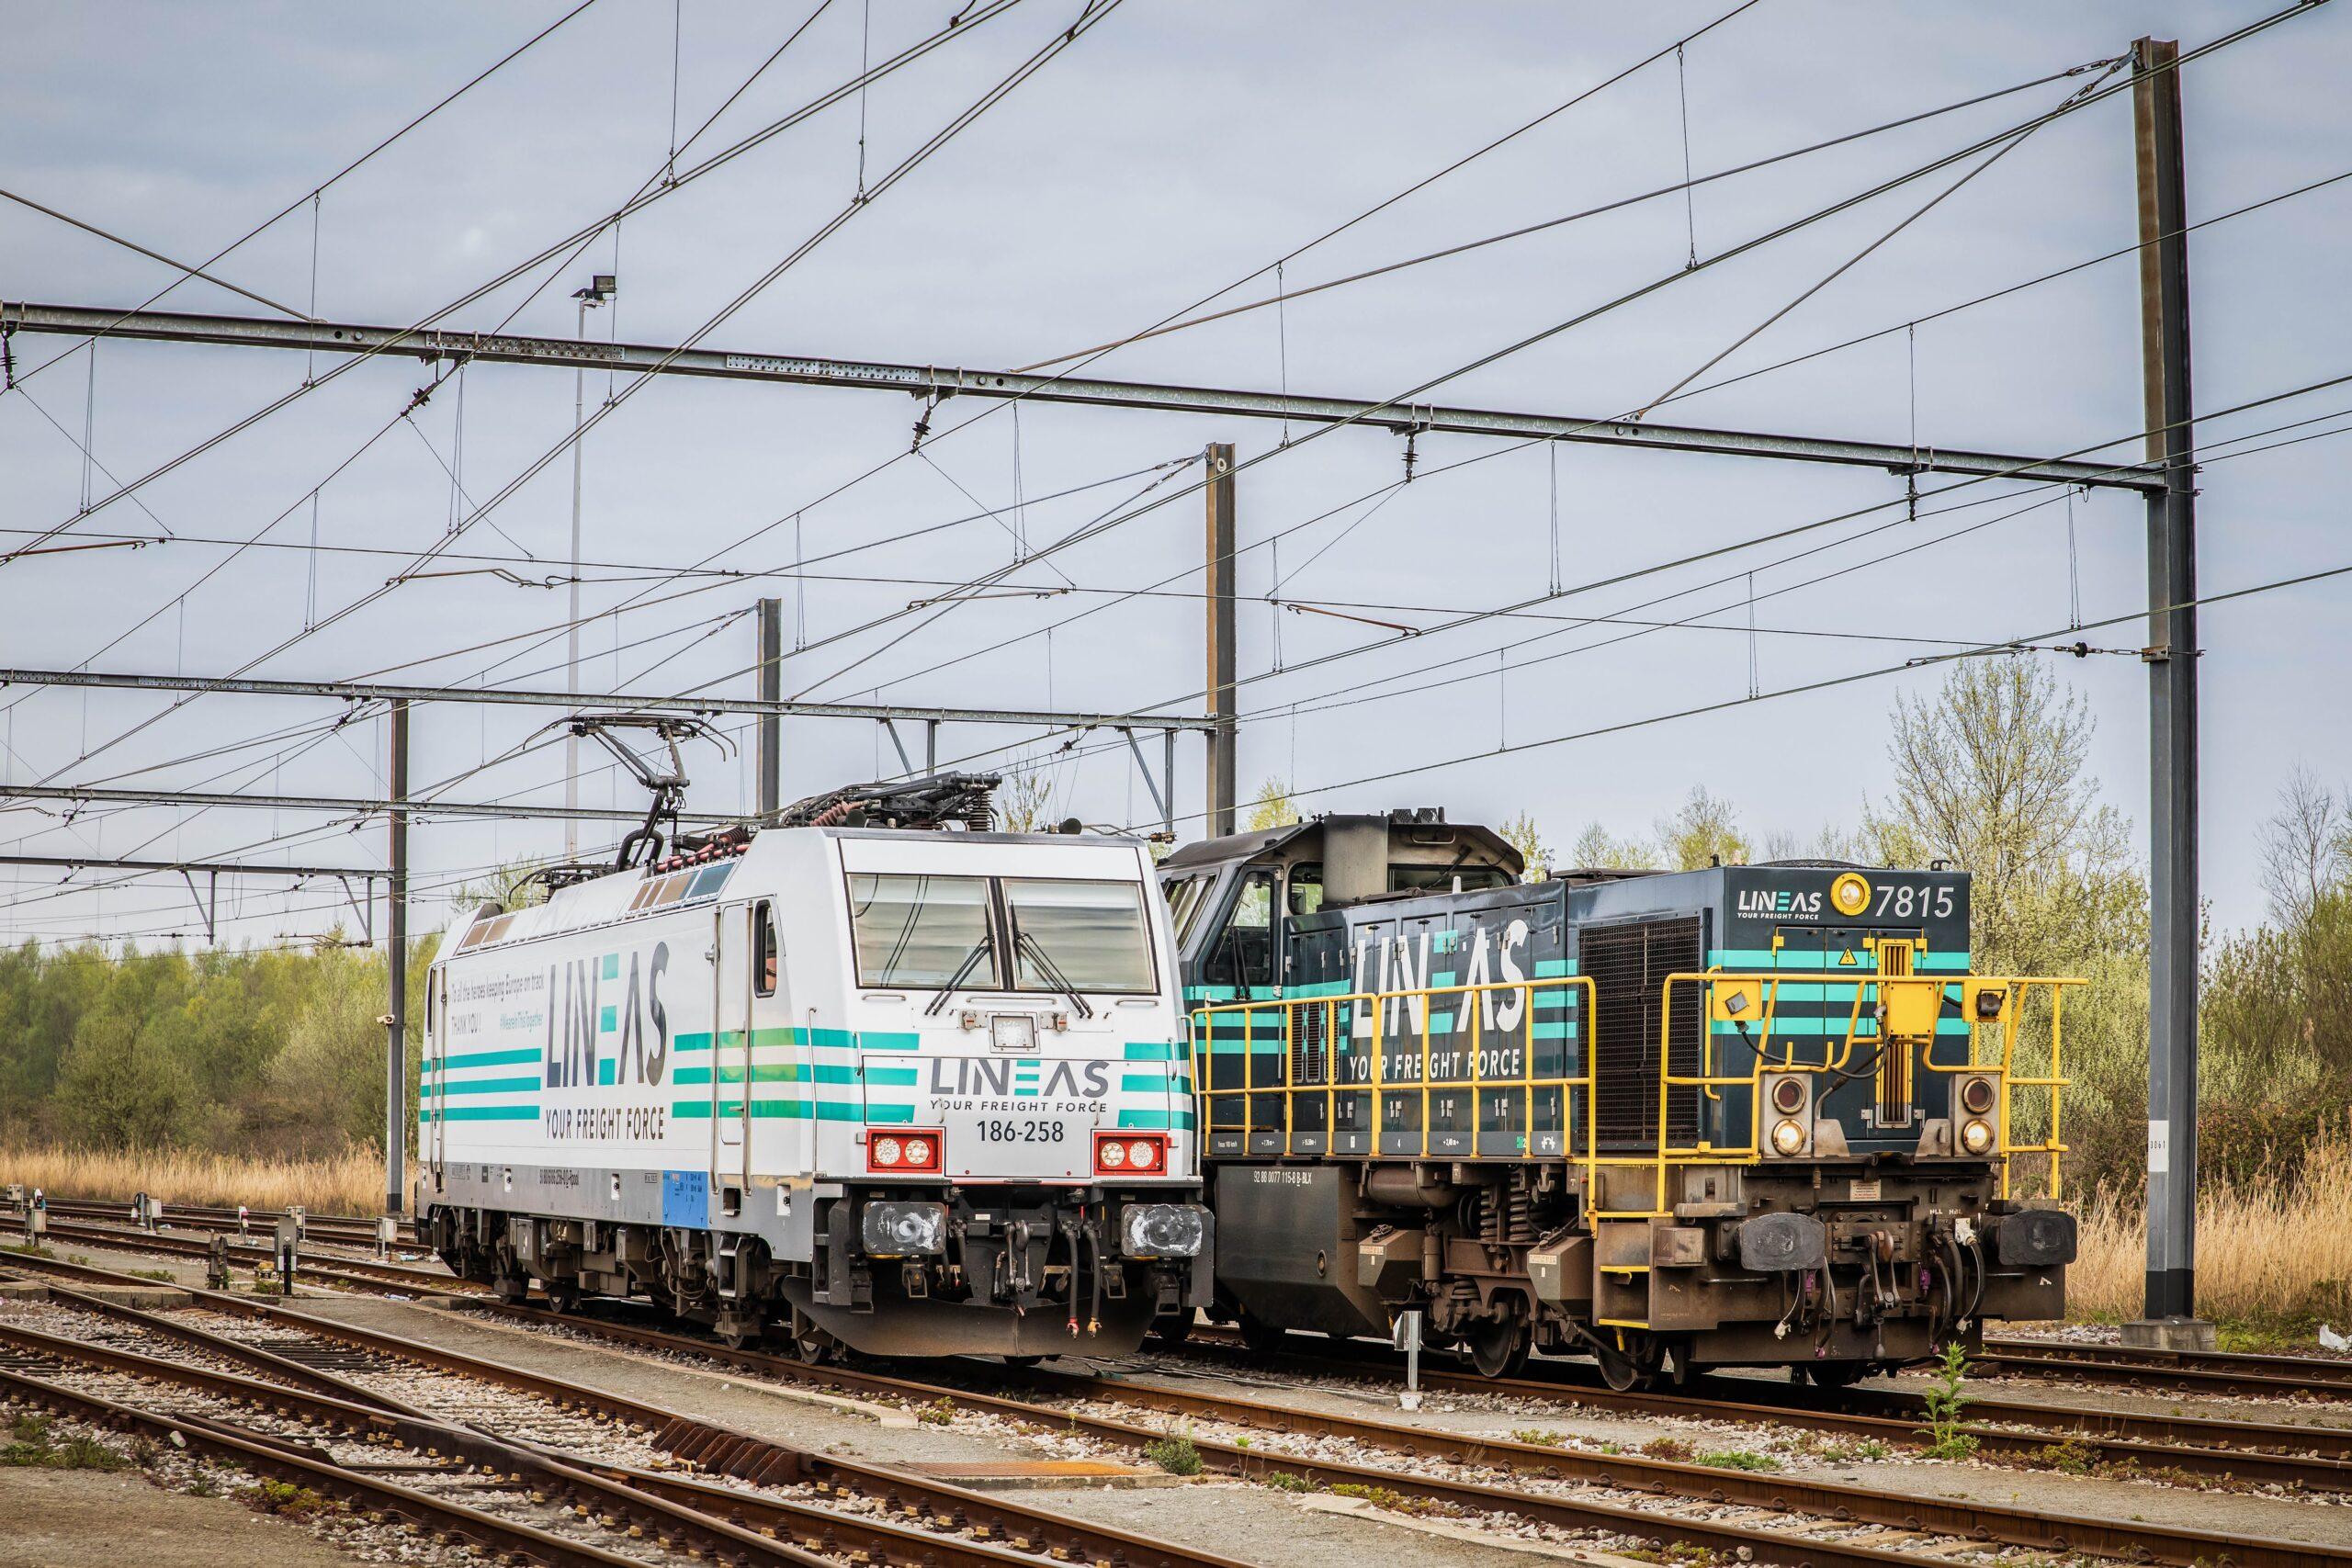 Lineas shunting locomotive